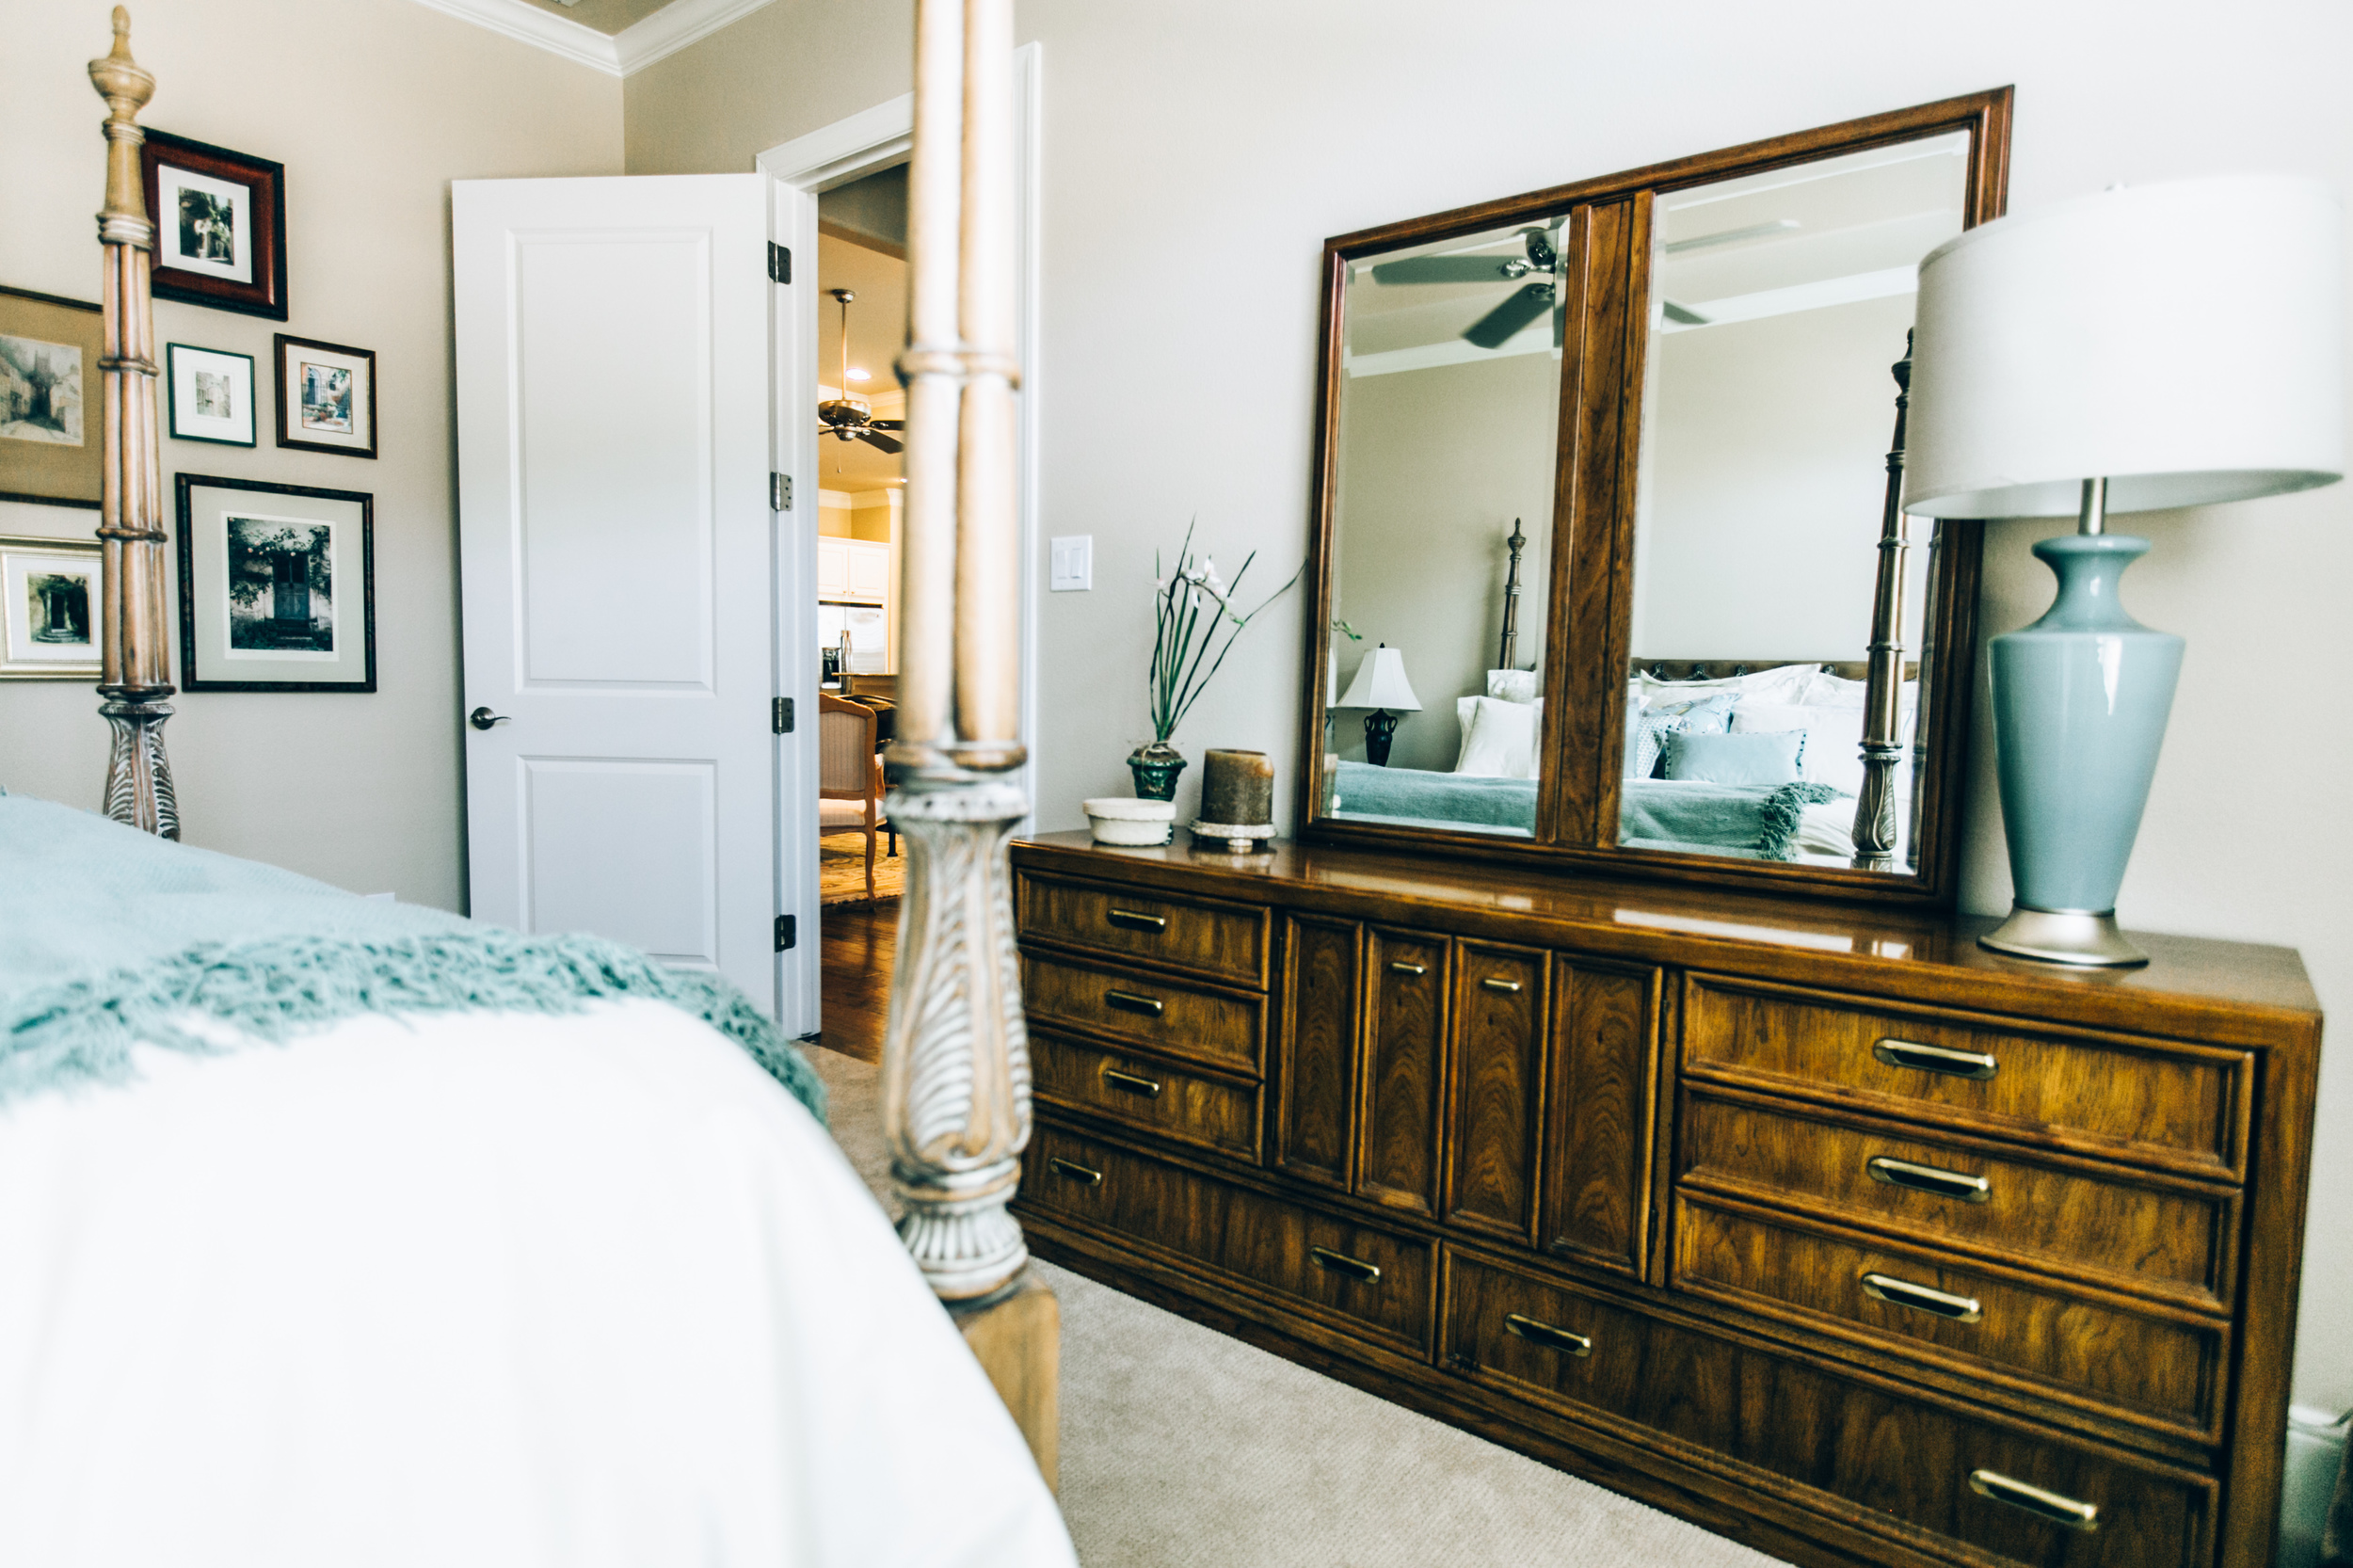 interior-design-home-decorating-354.jpg